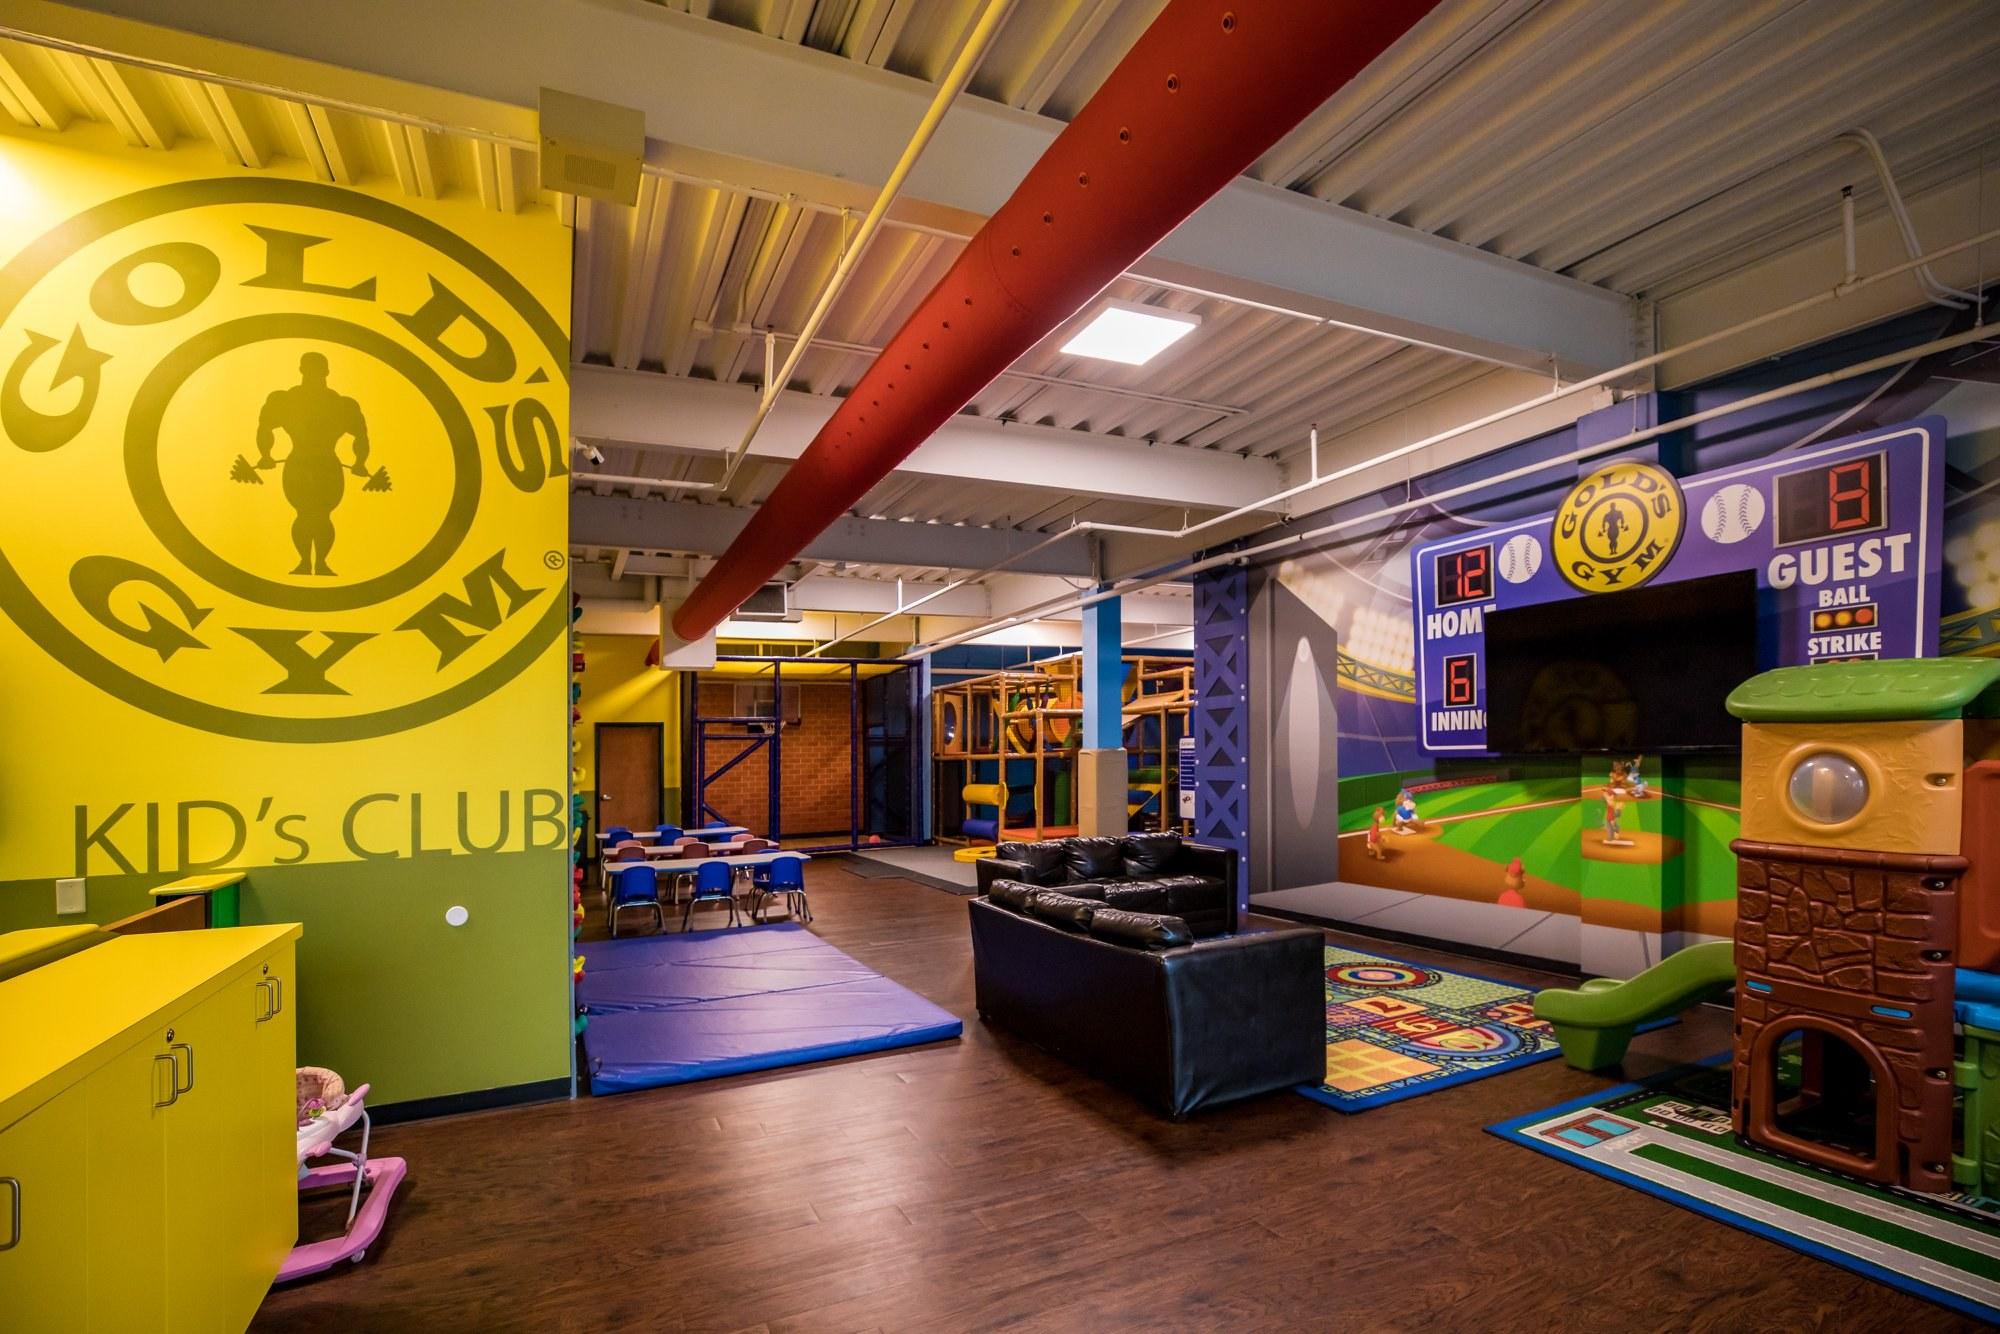 Gold's Gym club house